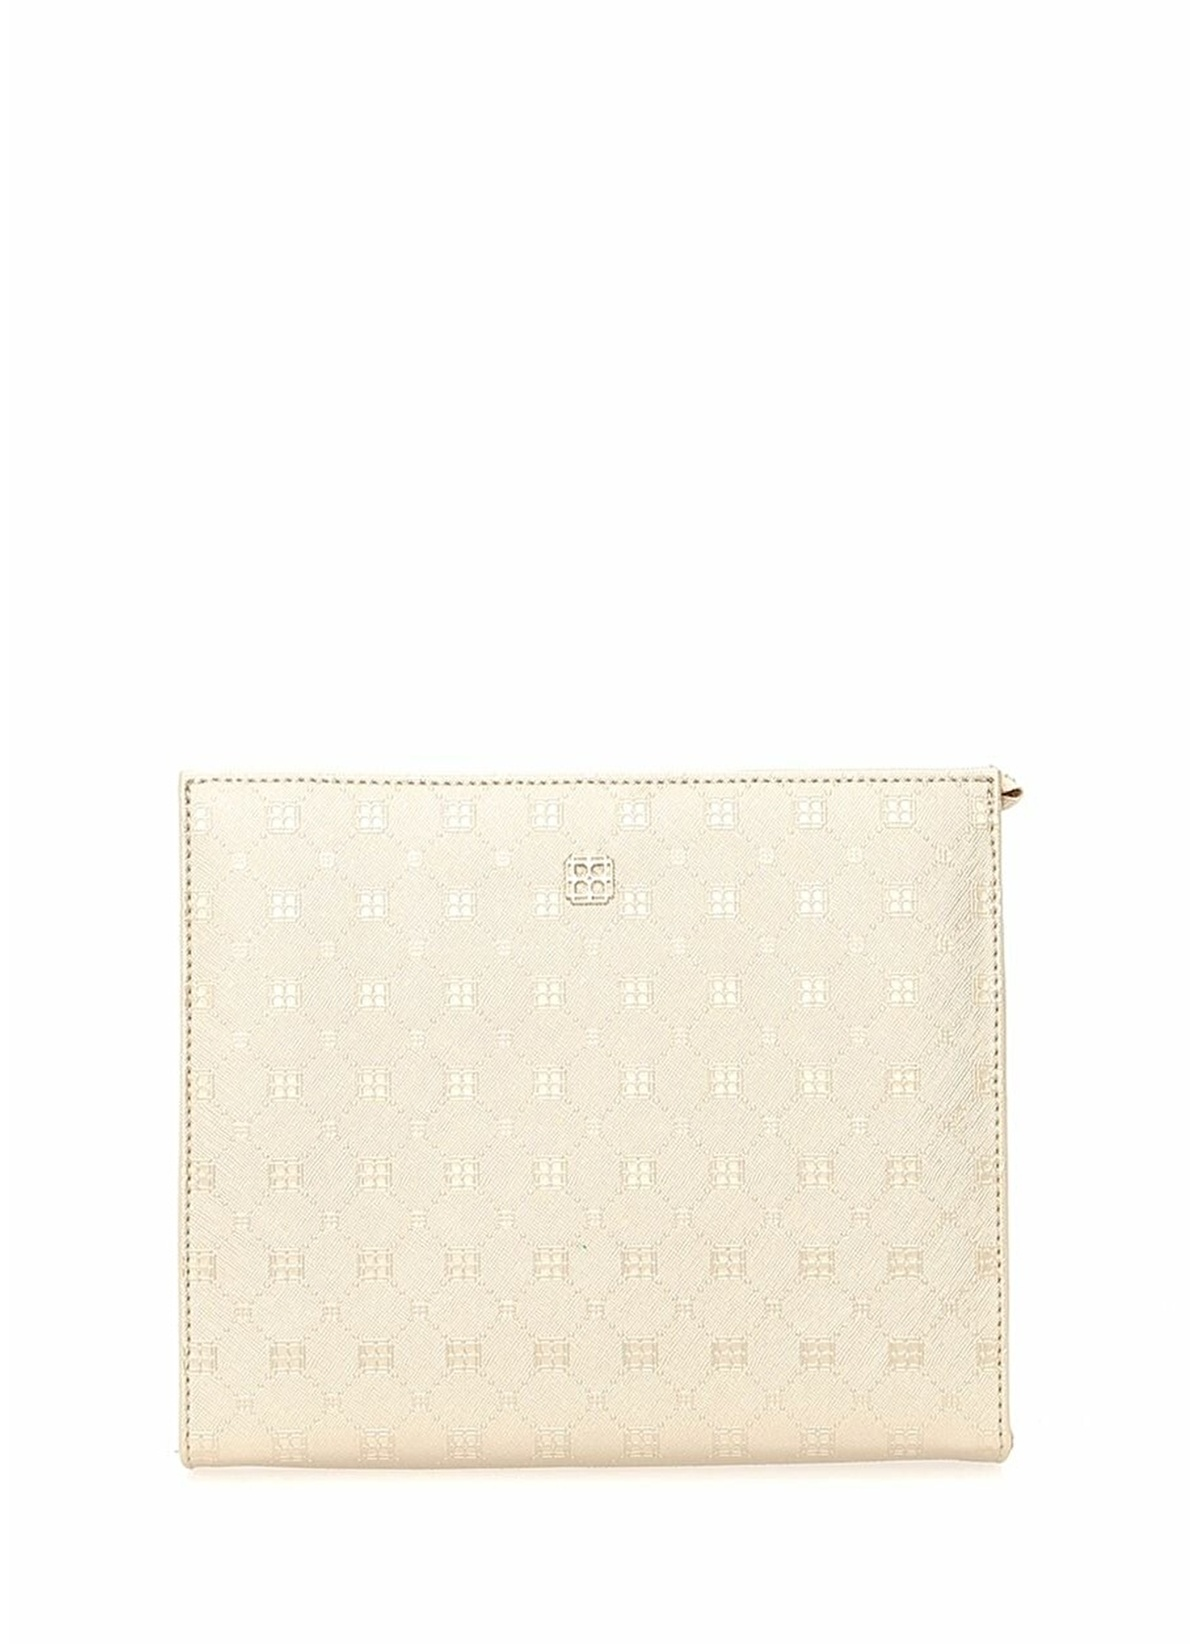 Beymen Clutch – El Çantası 101370552-k-el-portföyü – 299.0 TL